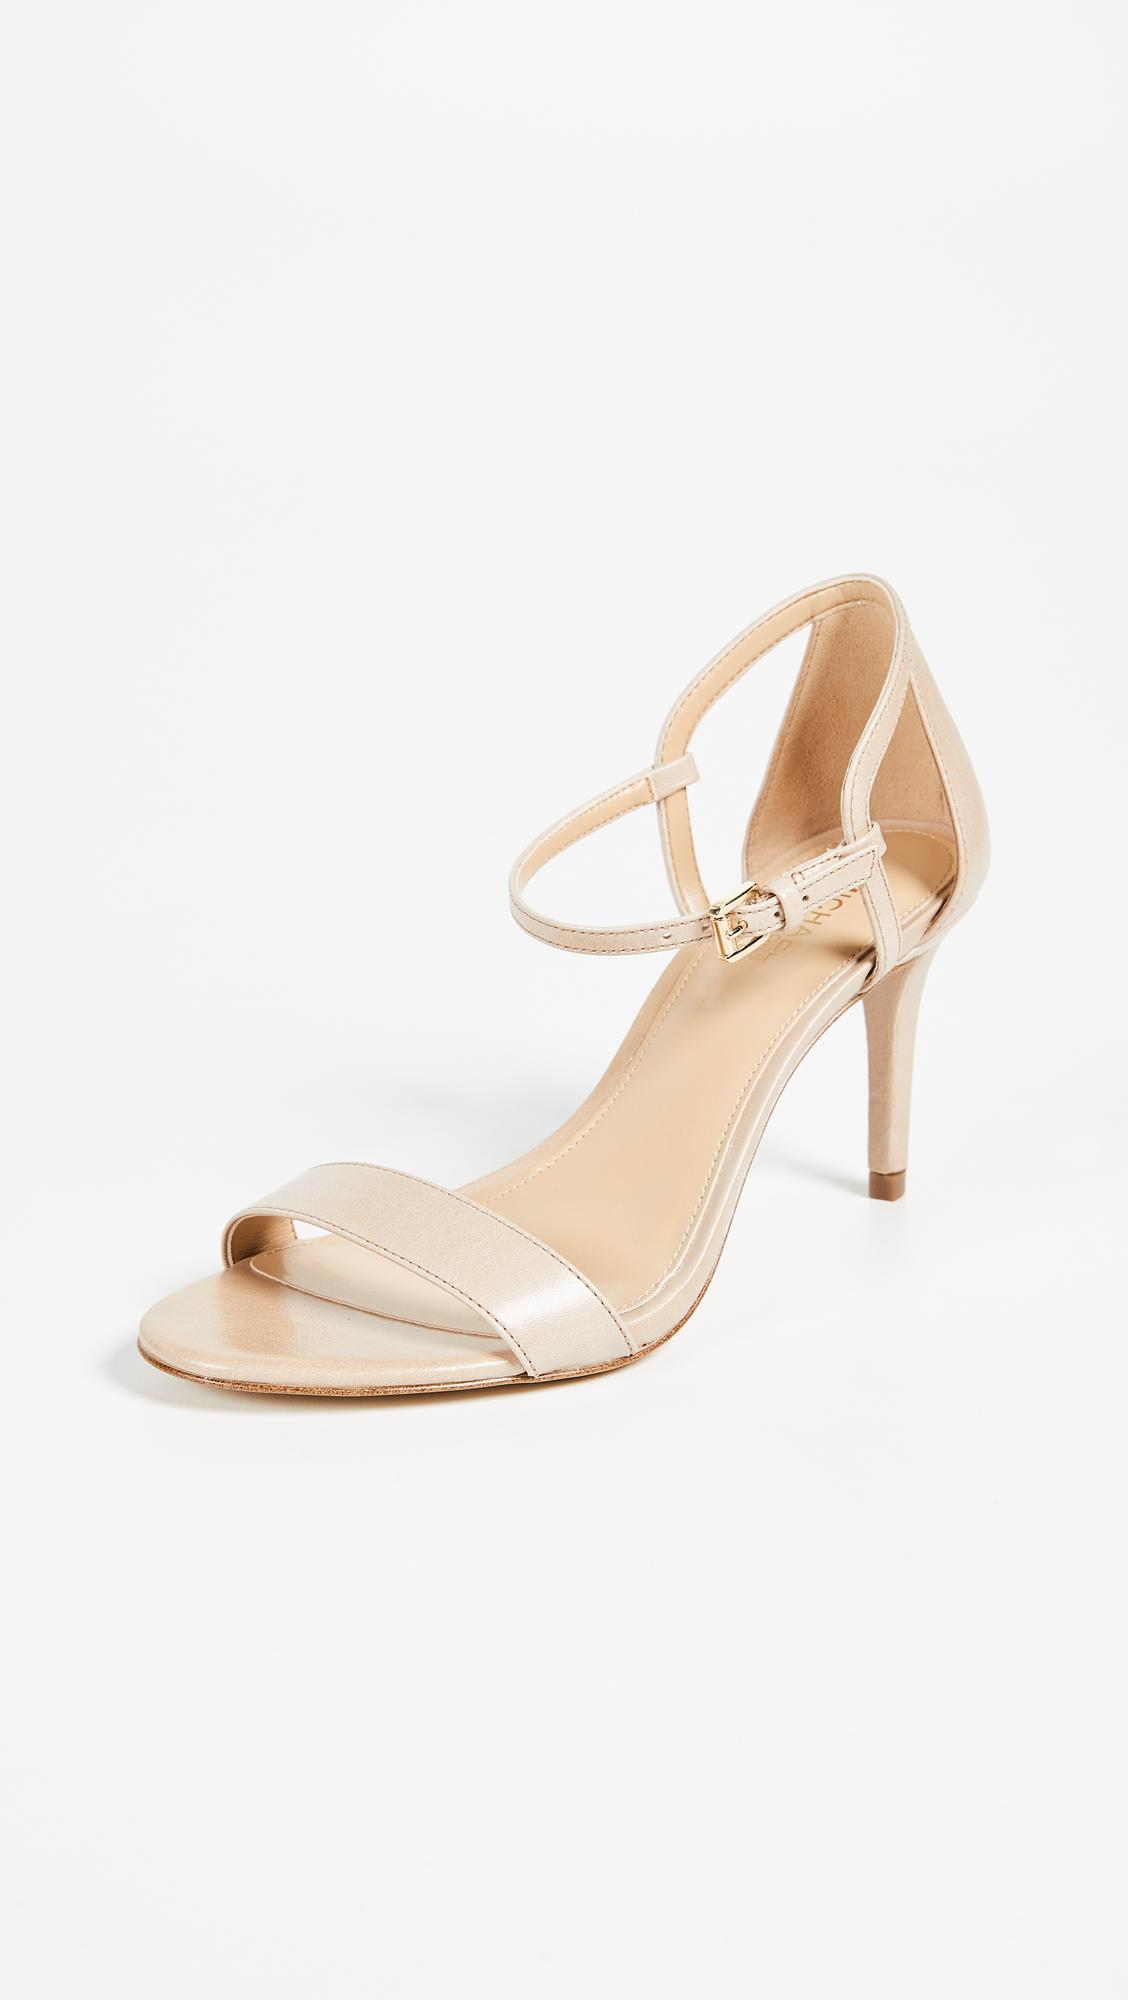 7b1beac54ef2 MICHAEL Michael Kors Simone Mid Sandals in Natural - Lyst